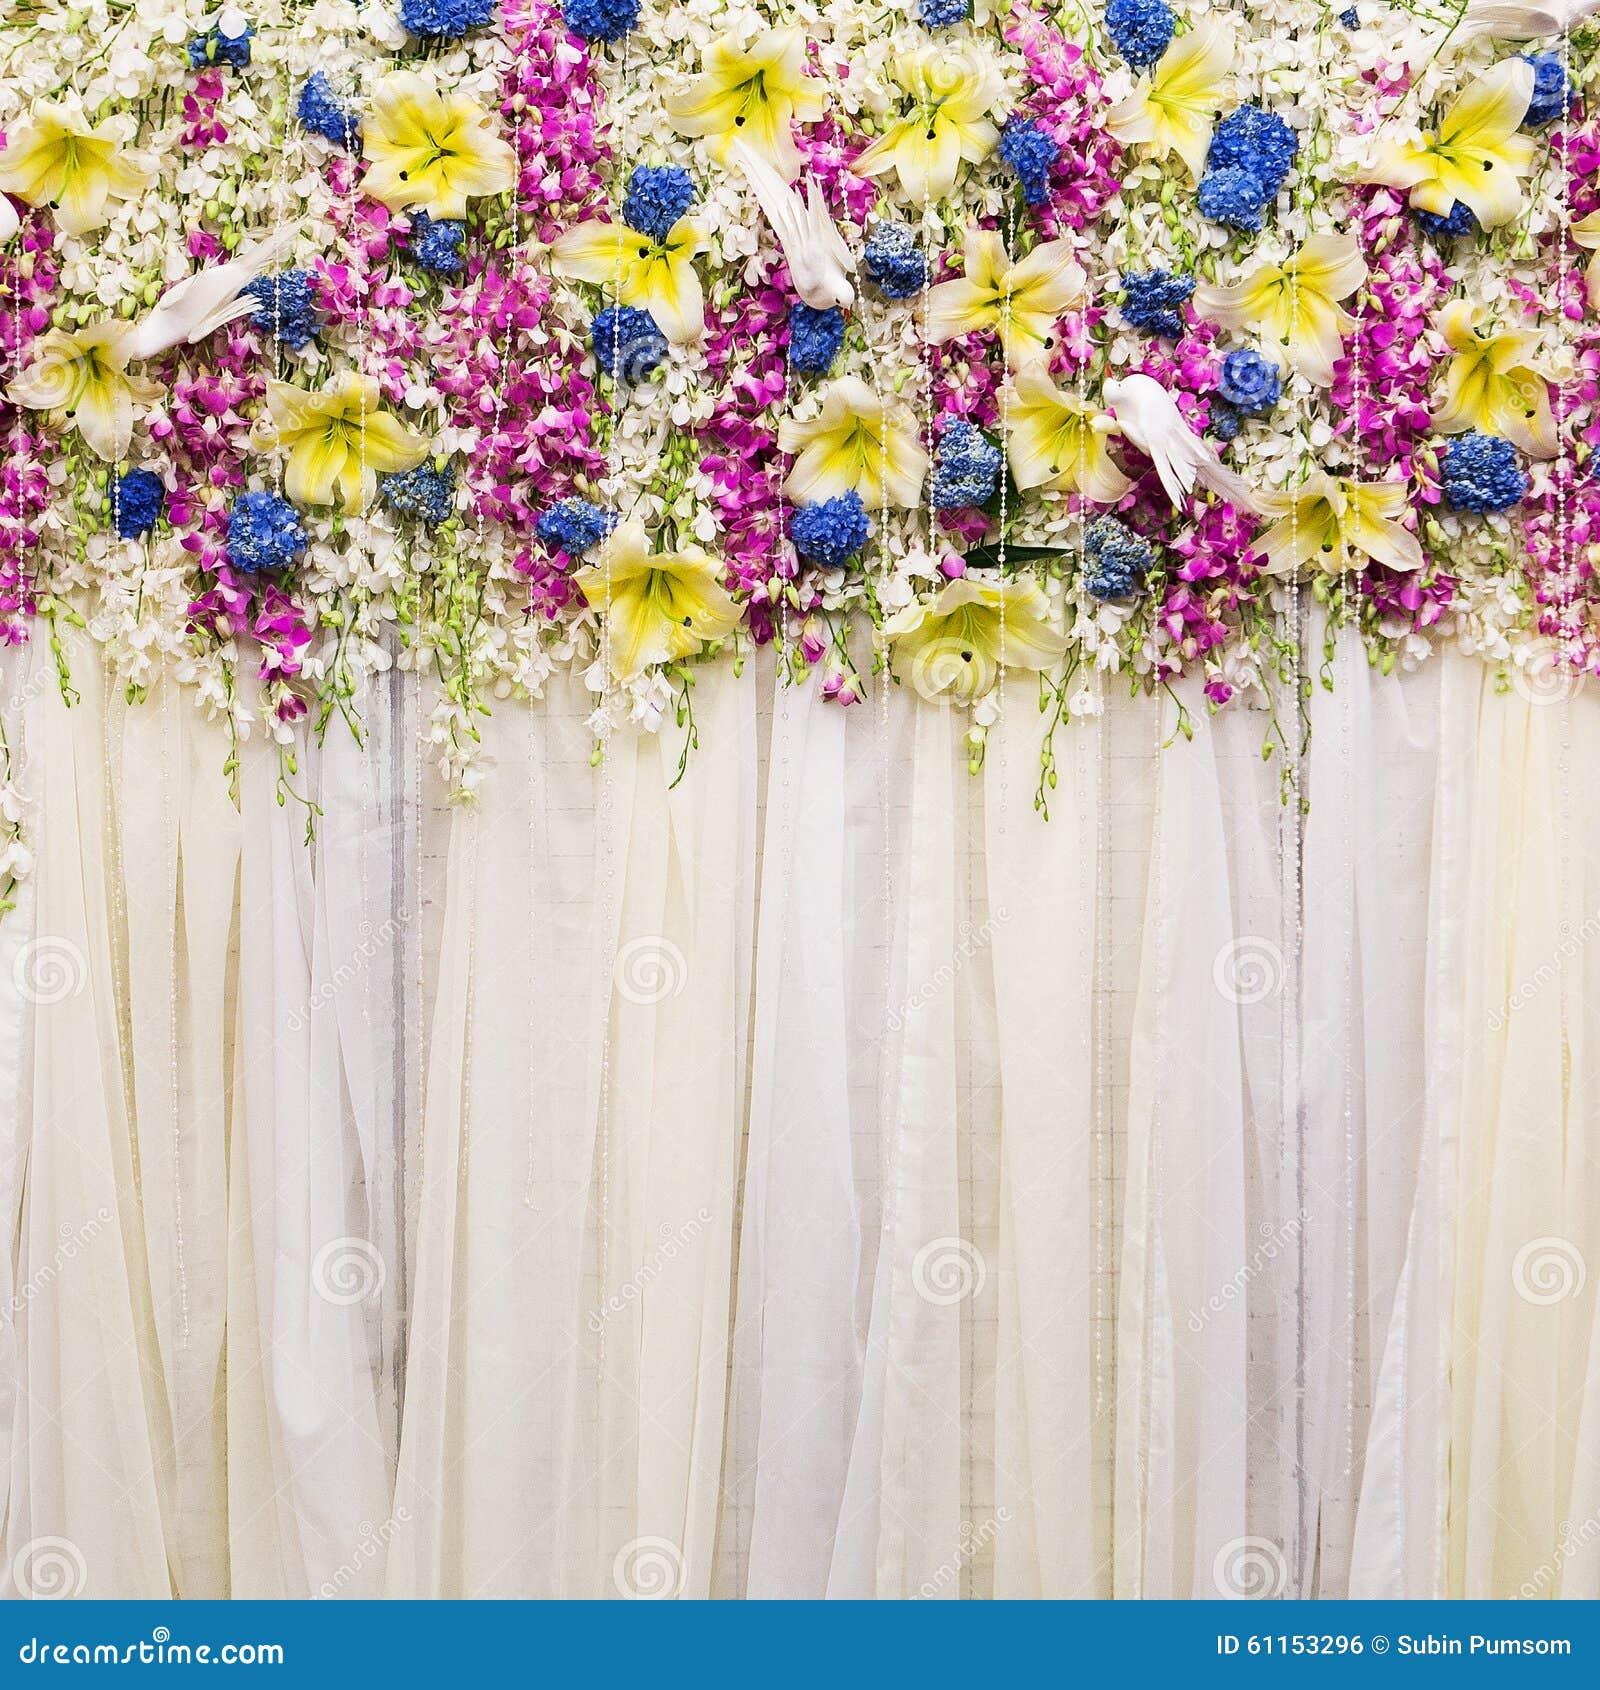 Wedding Flower Background: Beautiful Flowers Background For Wedding Stock Photo